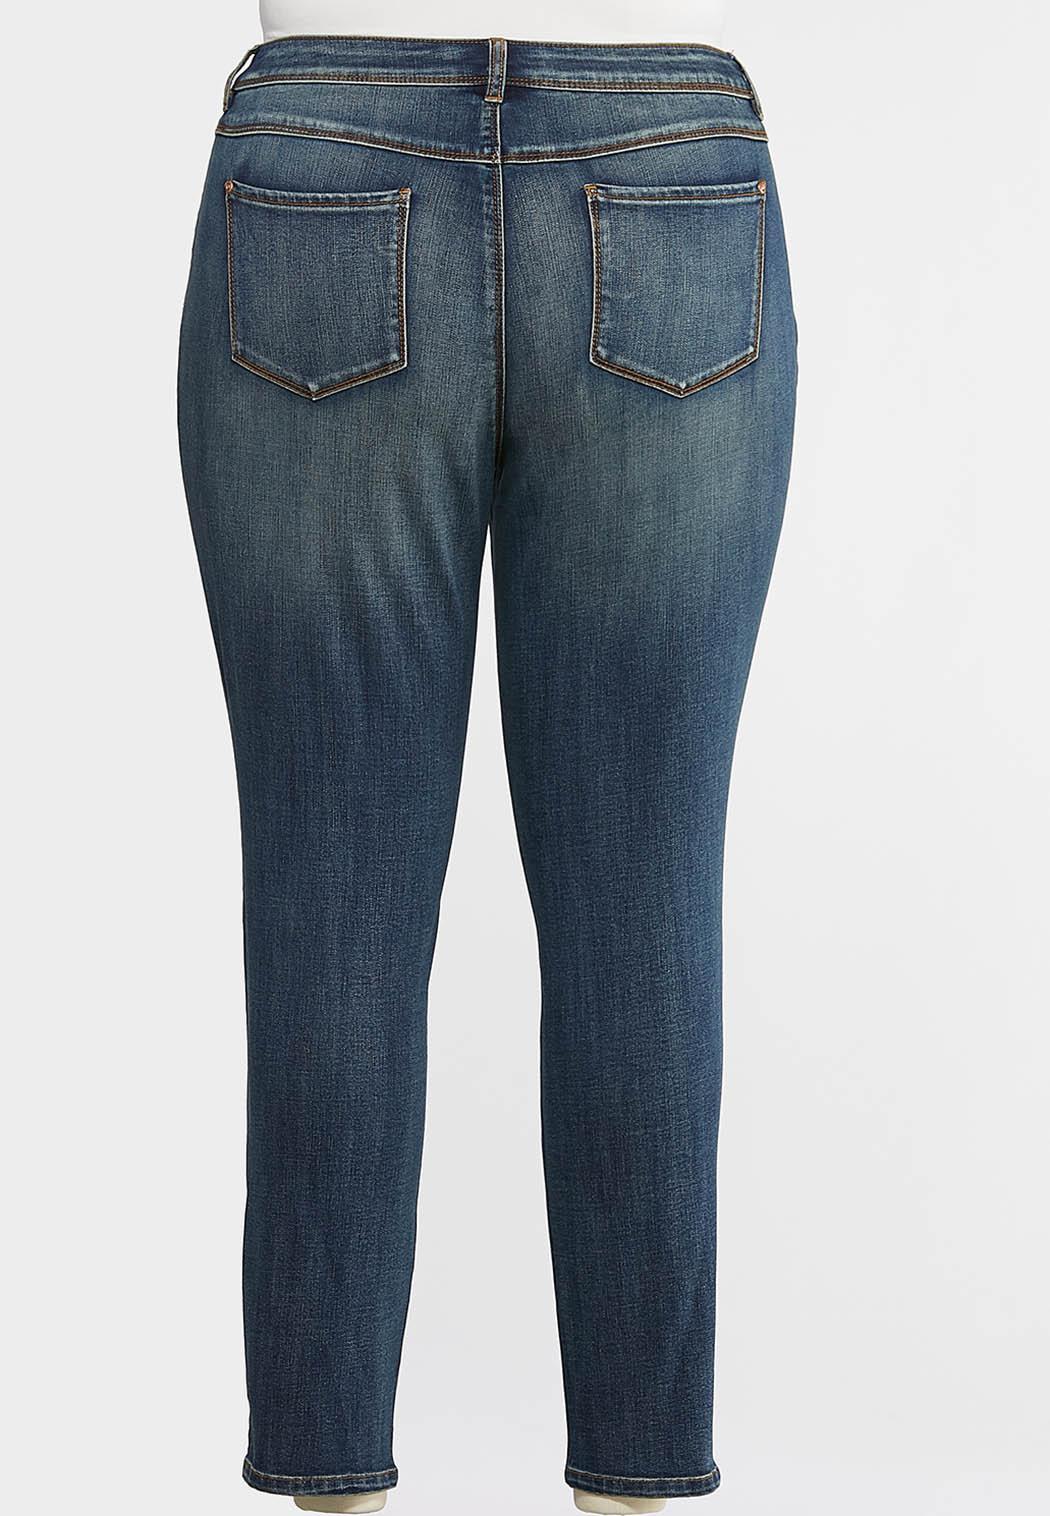 Plus Size Slimming Skinny Jeans (Item #43992718)